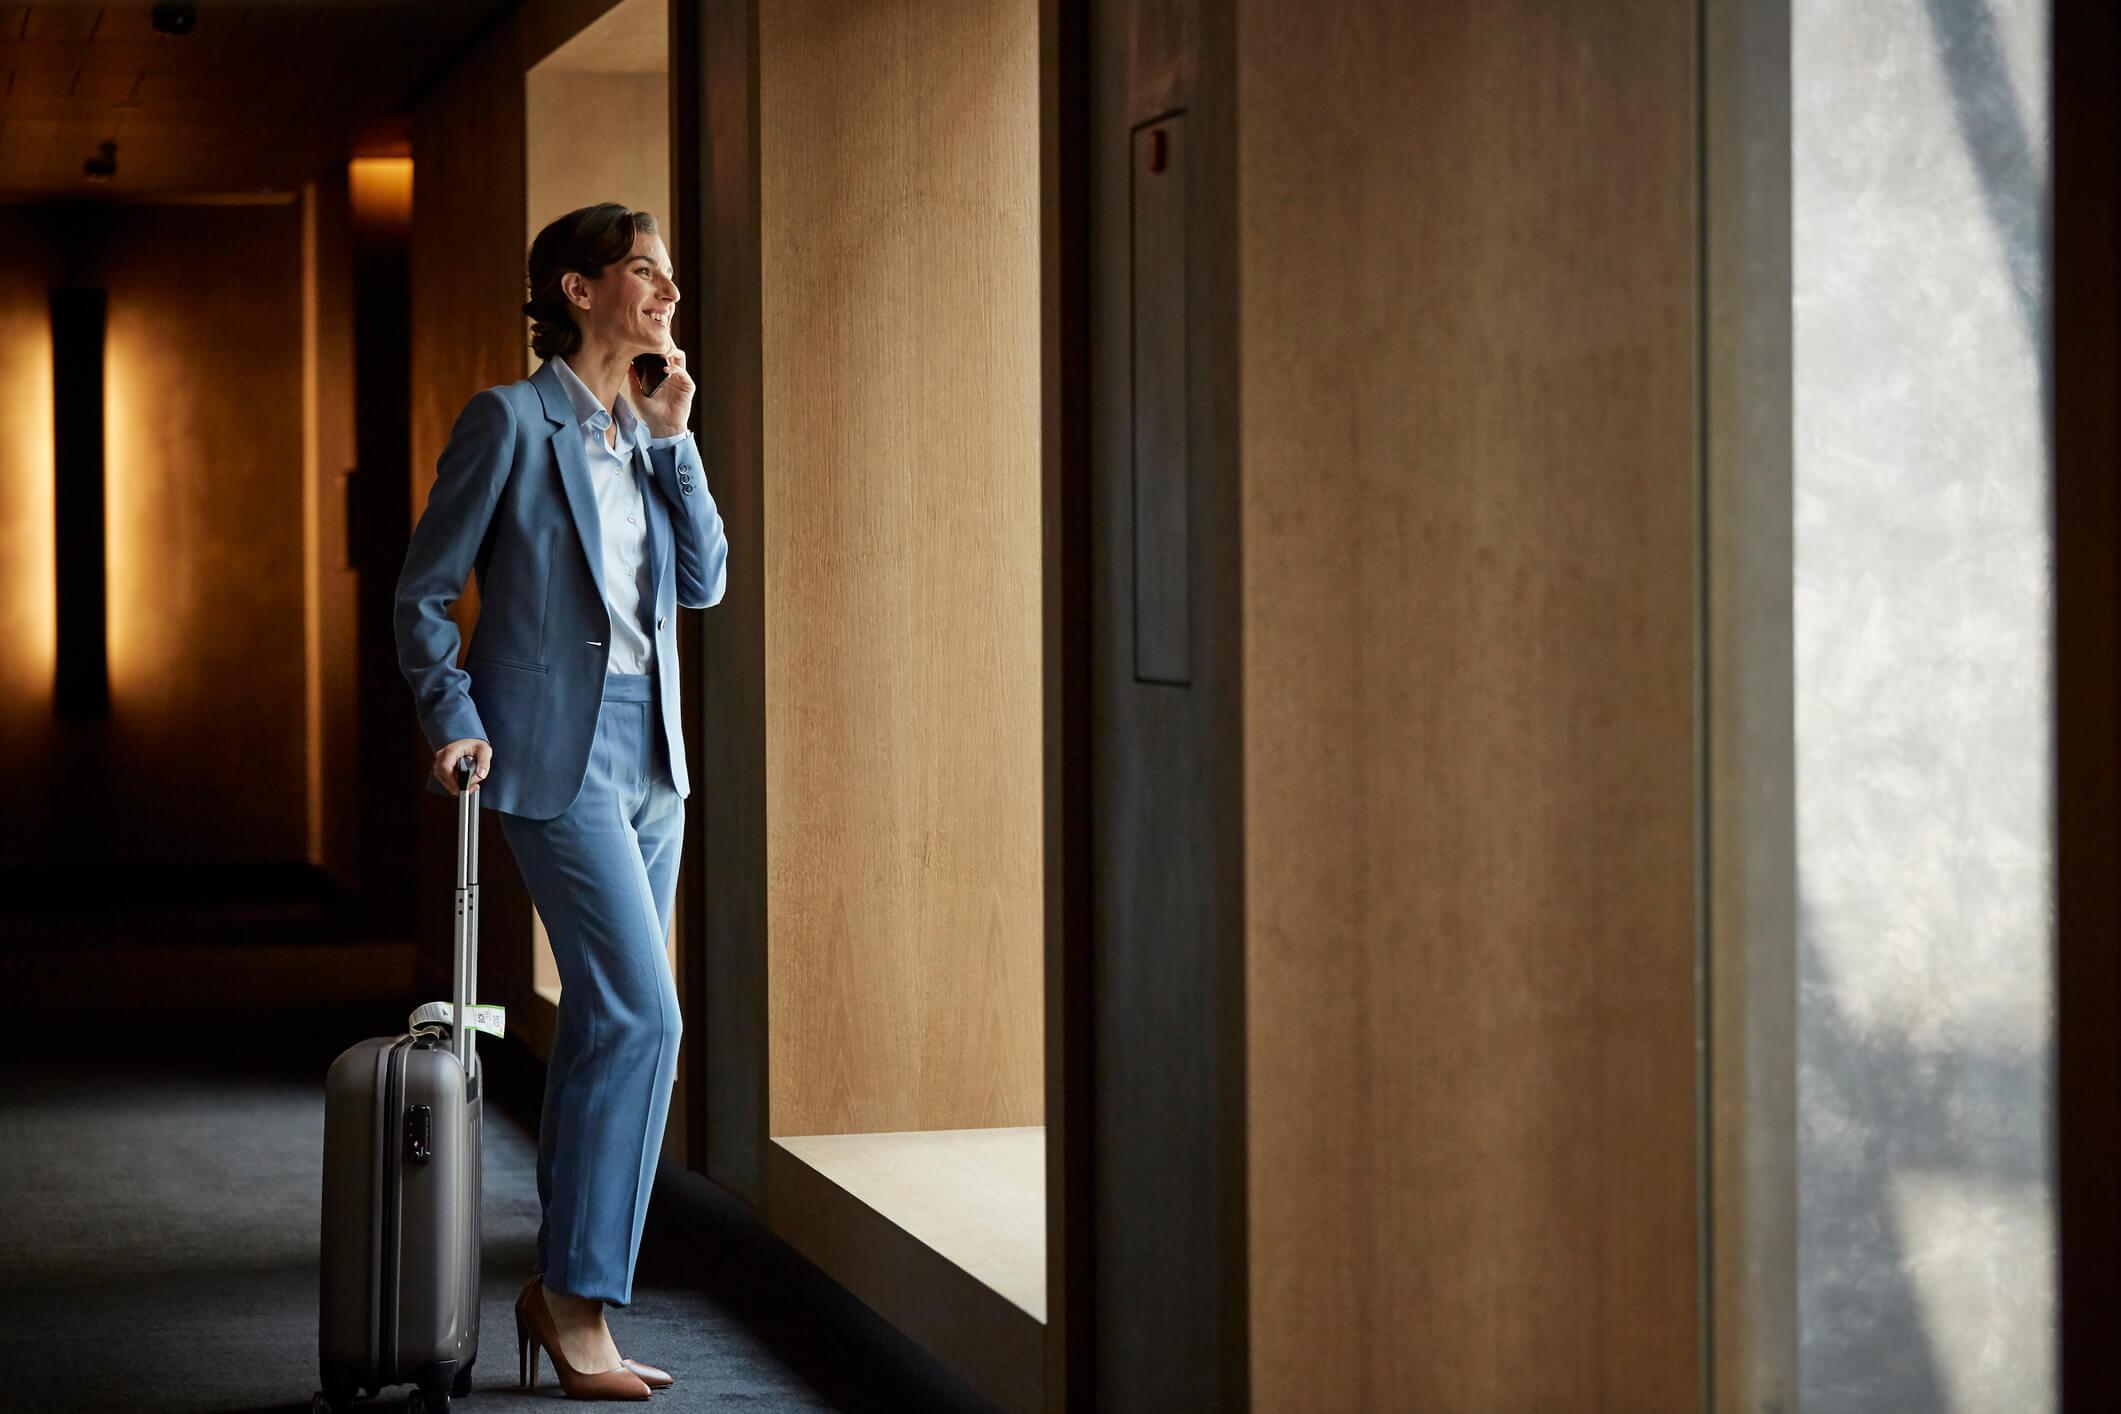 Viagem corporativa internaciona - Argo Solutions - Simplifying your journey